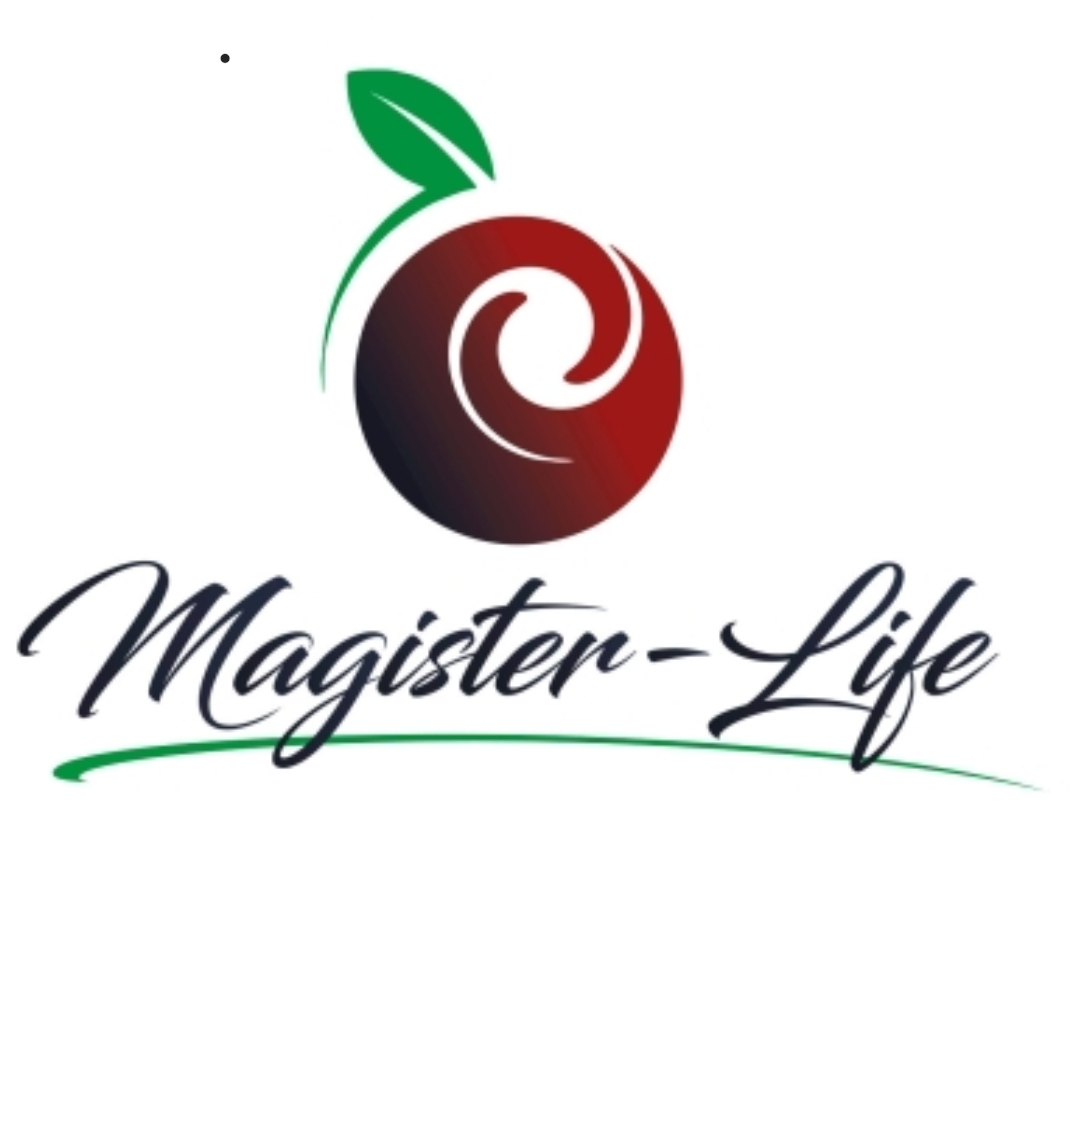 Magister-life